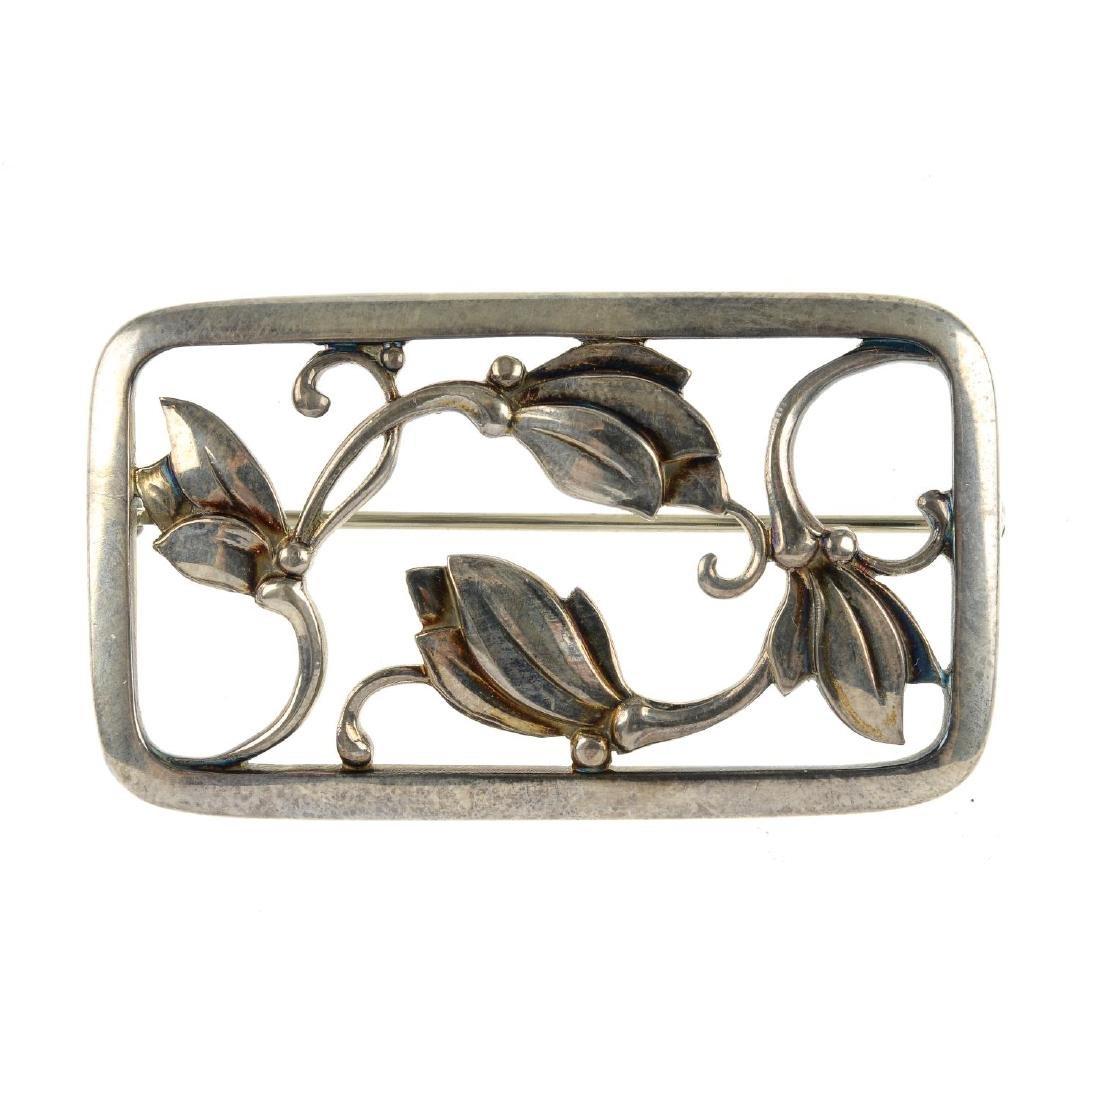 GEORG JENSEN - a brooch. Of rectangular outline, the